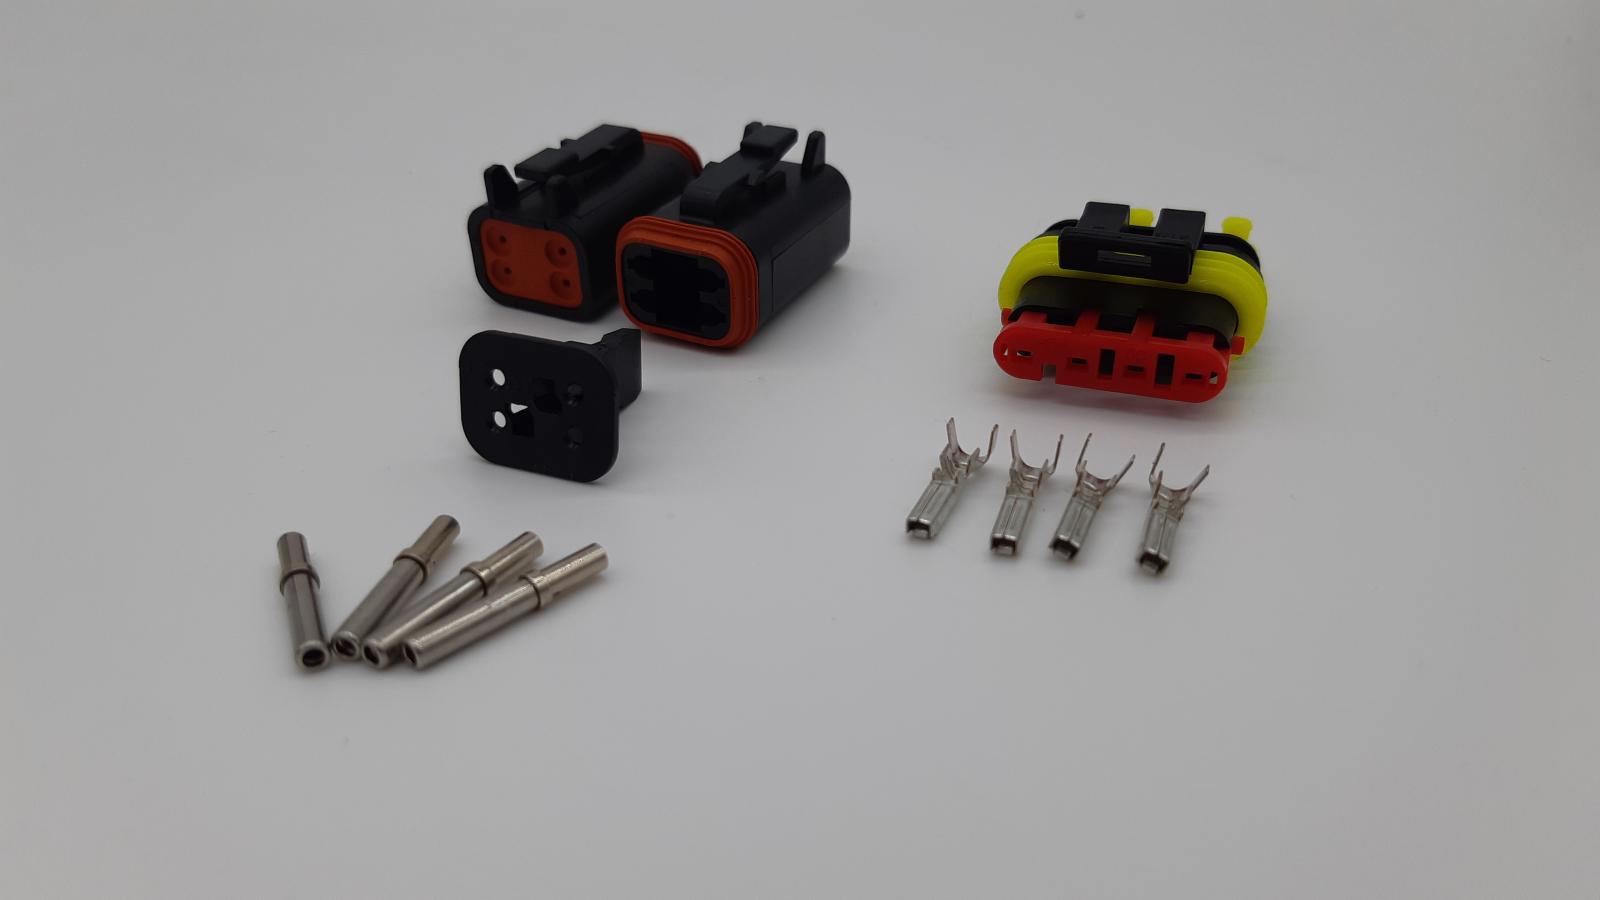 Links: Buchse DEUTSCH DT-Serie - Rechts: Buchse AMP Superseal